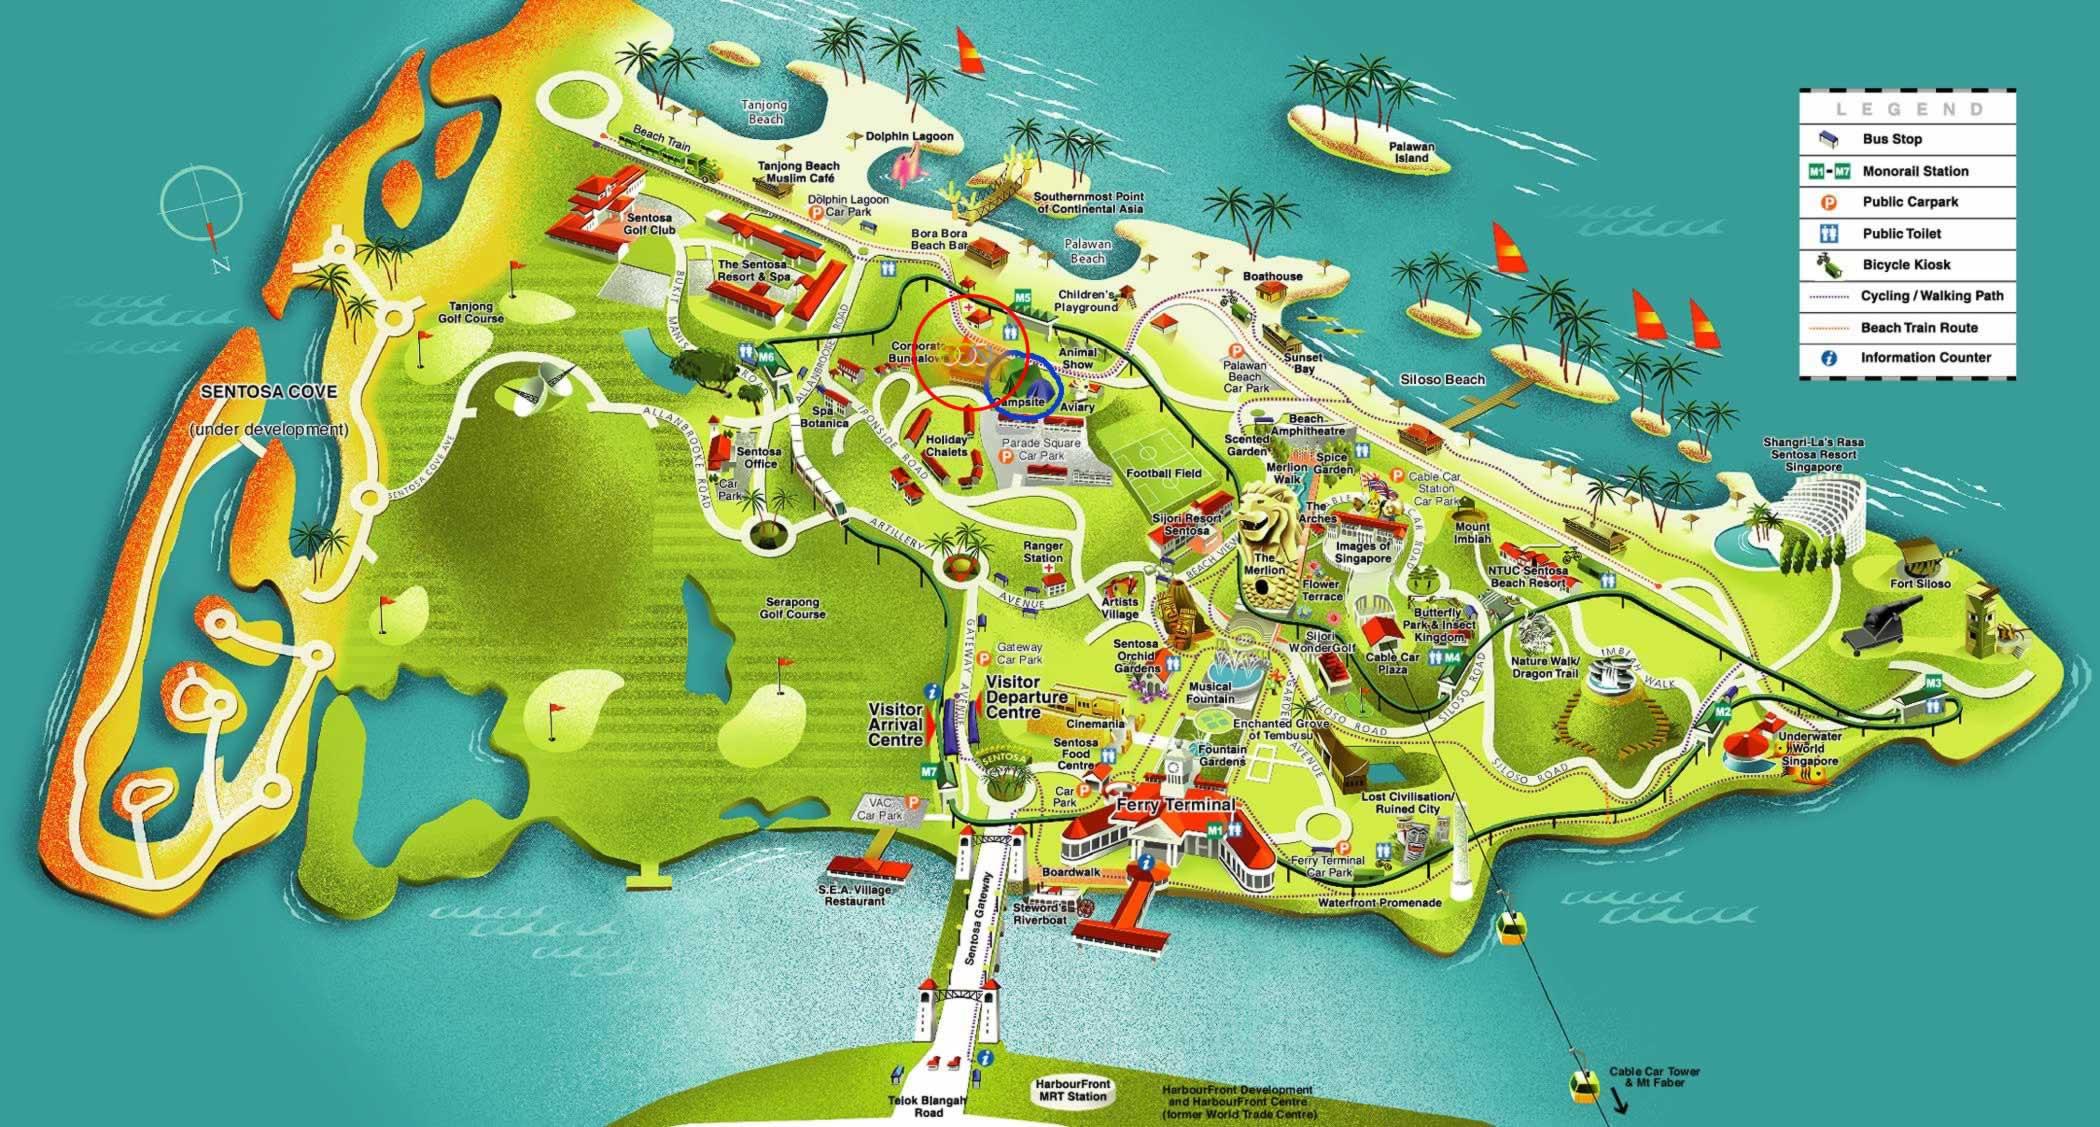 Sentosa casino map gumiabroncs Gallery